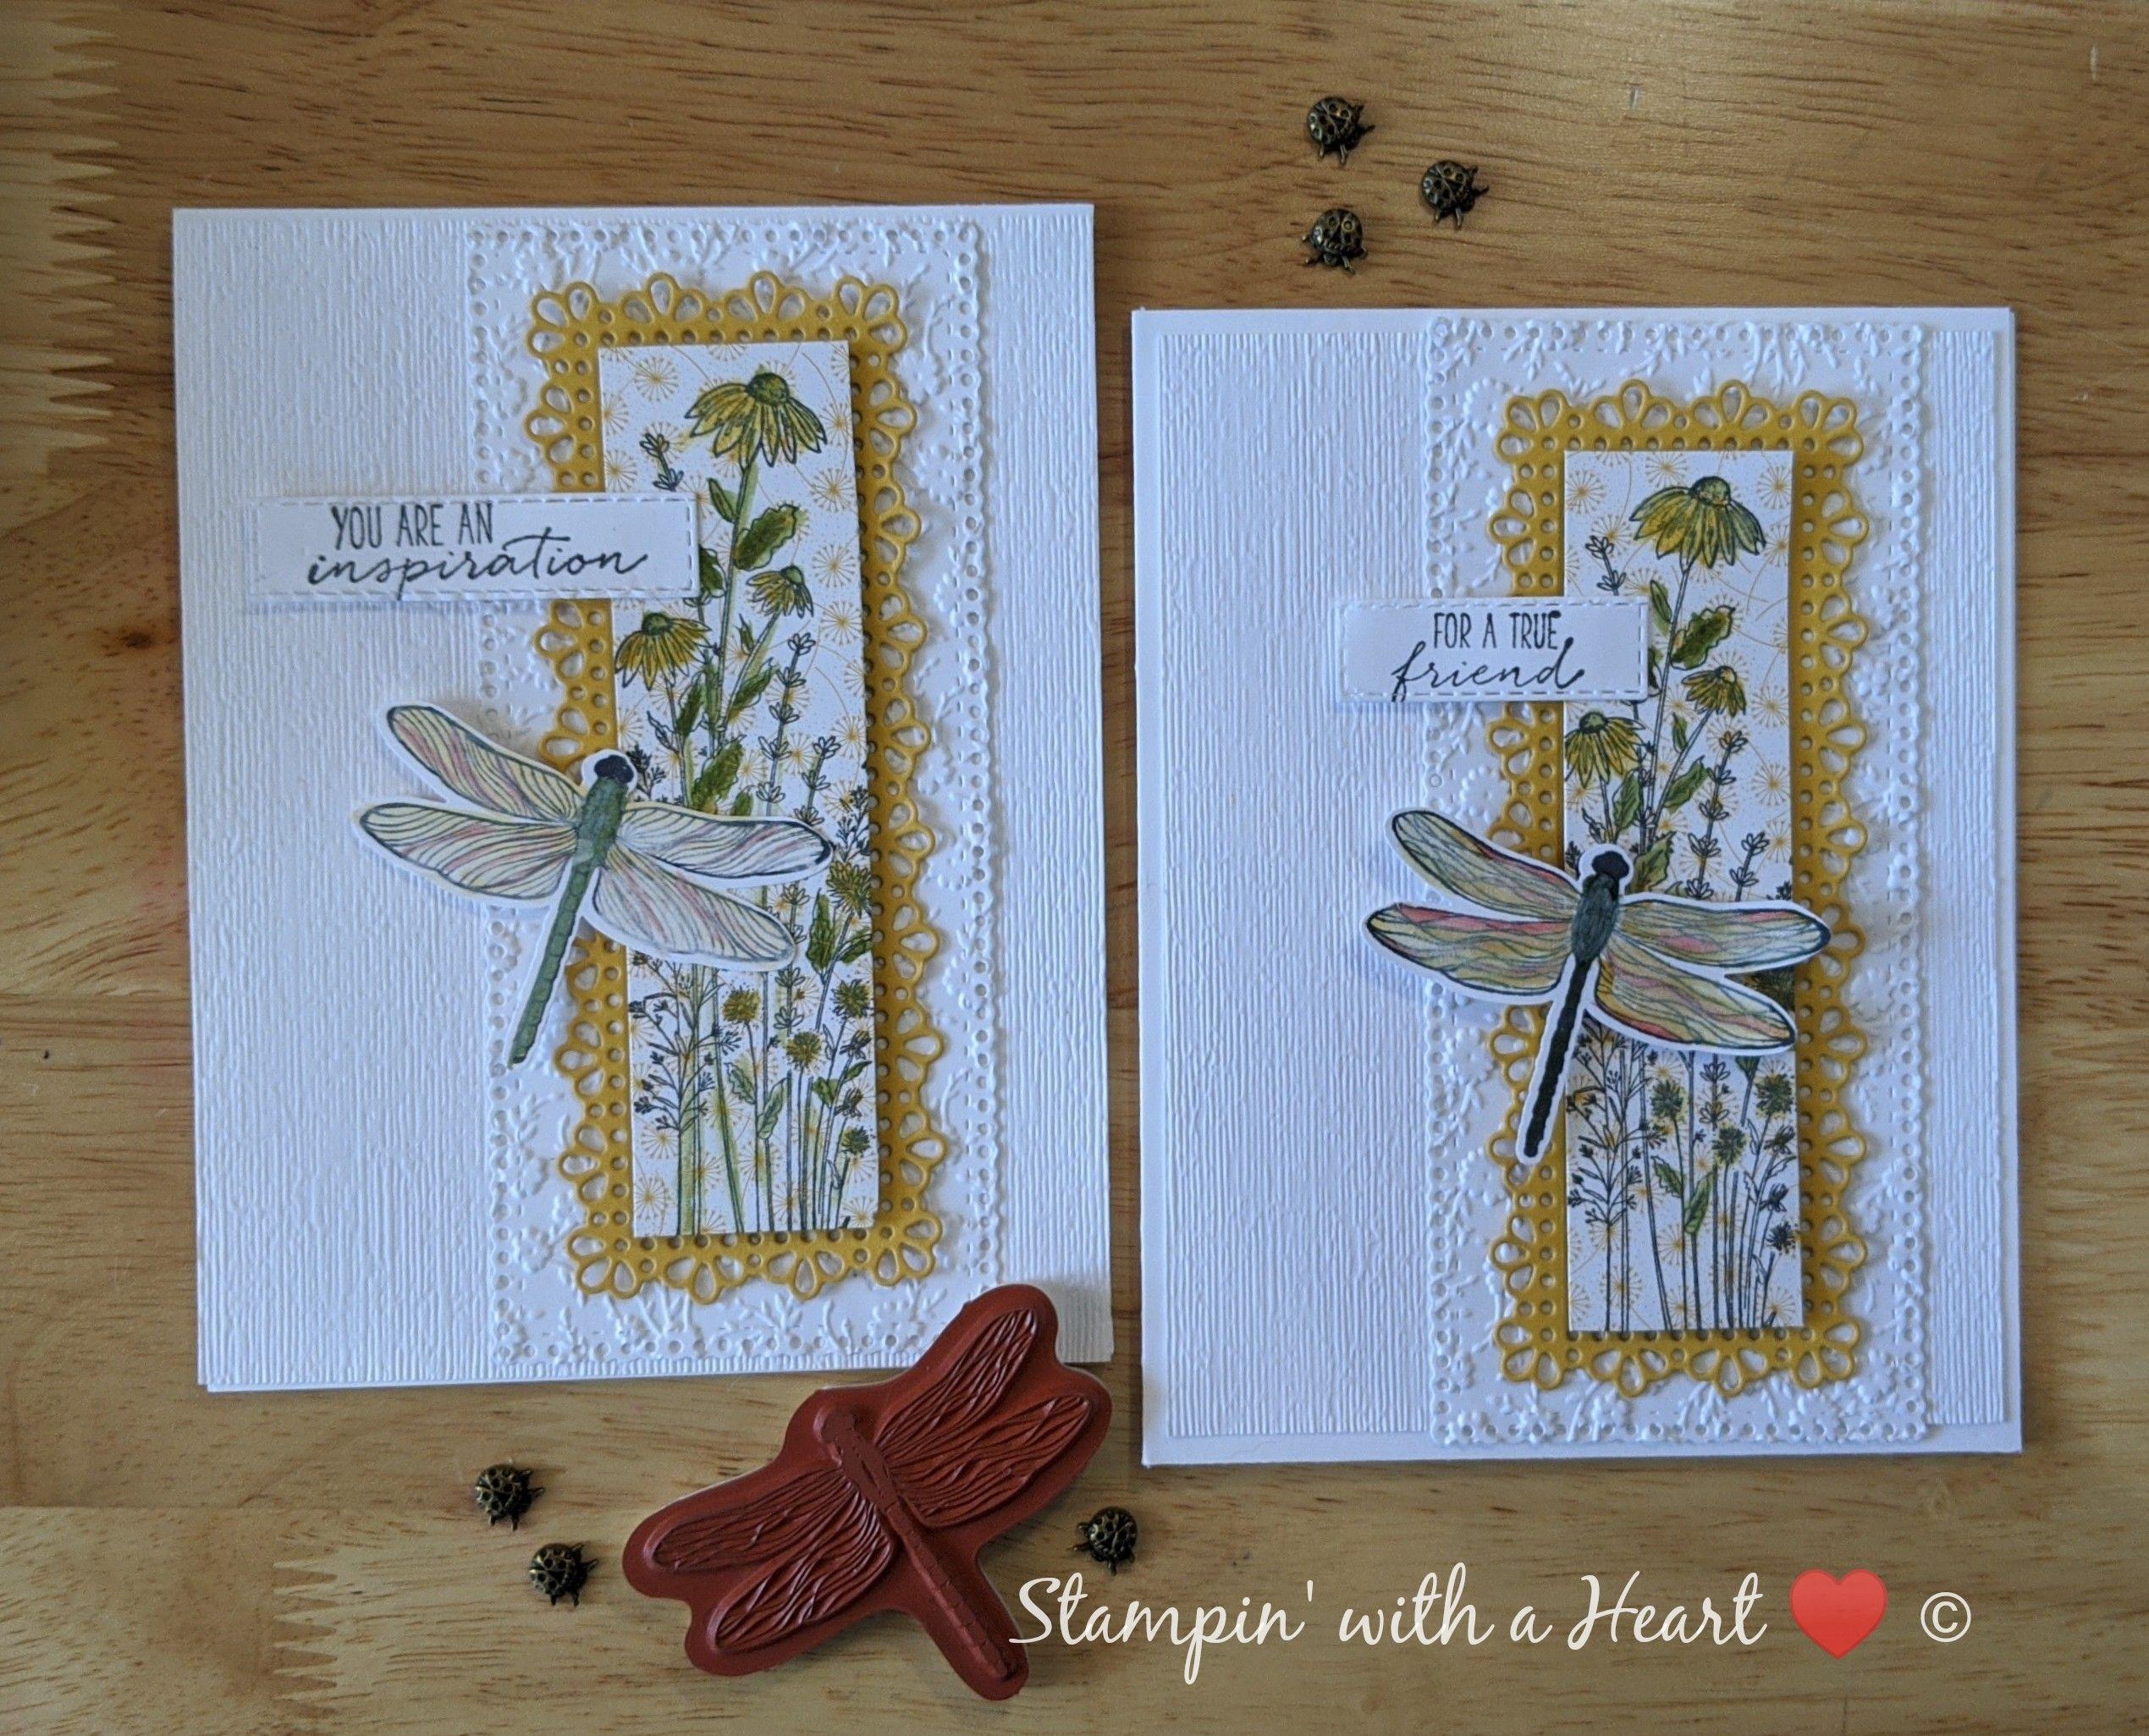 Dragonfly Garden sneak peek - Stampin' With a Hear